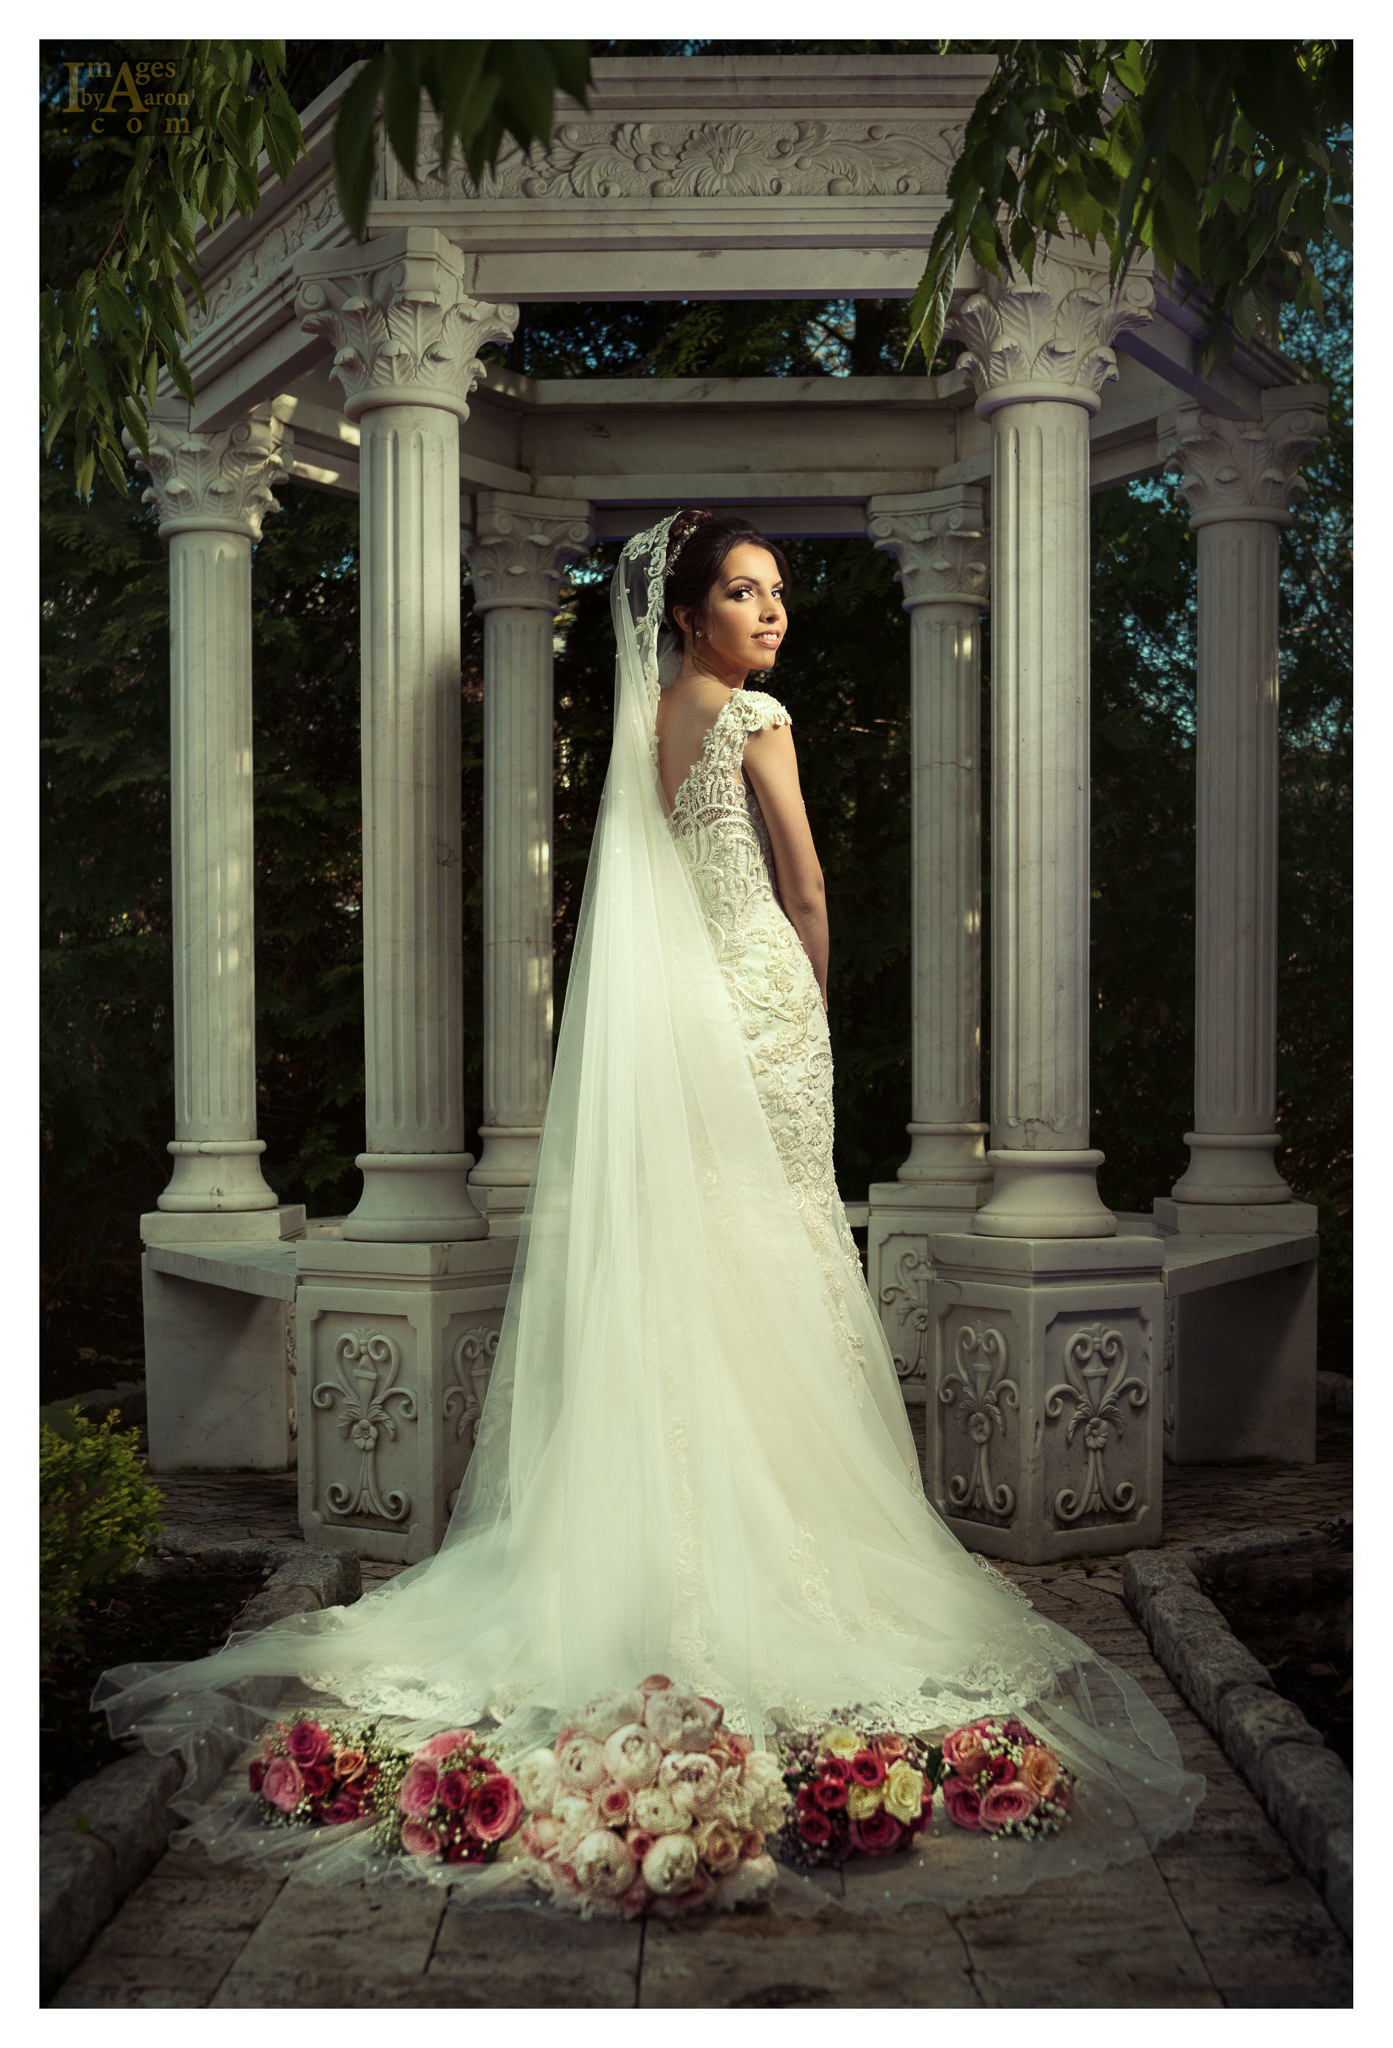 Gokce Turkish Wedding Portraits New York Photography The Royal Manor-8.jpg